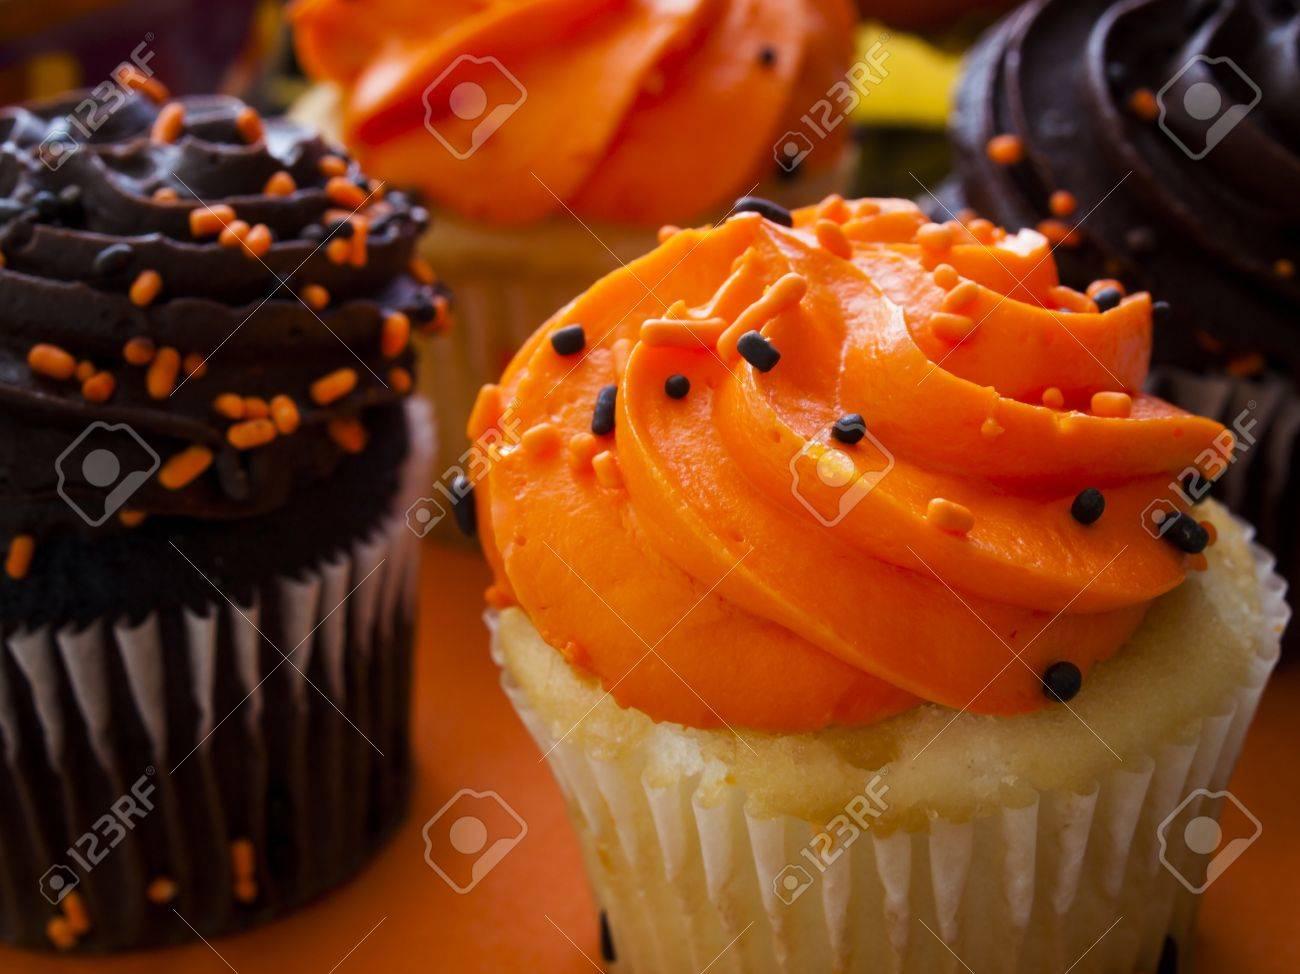 halloween cupcakes with orange and black icing on orange napkin